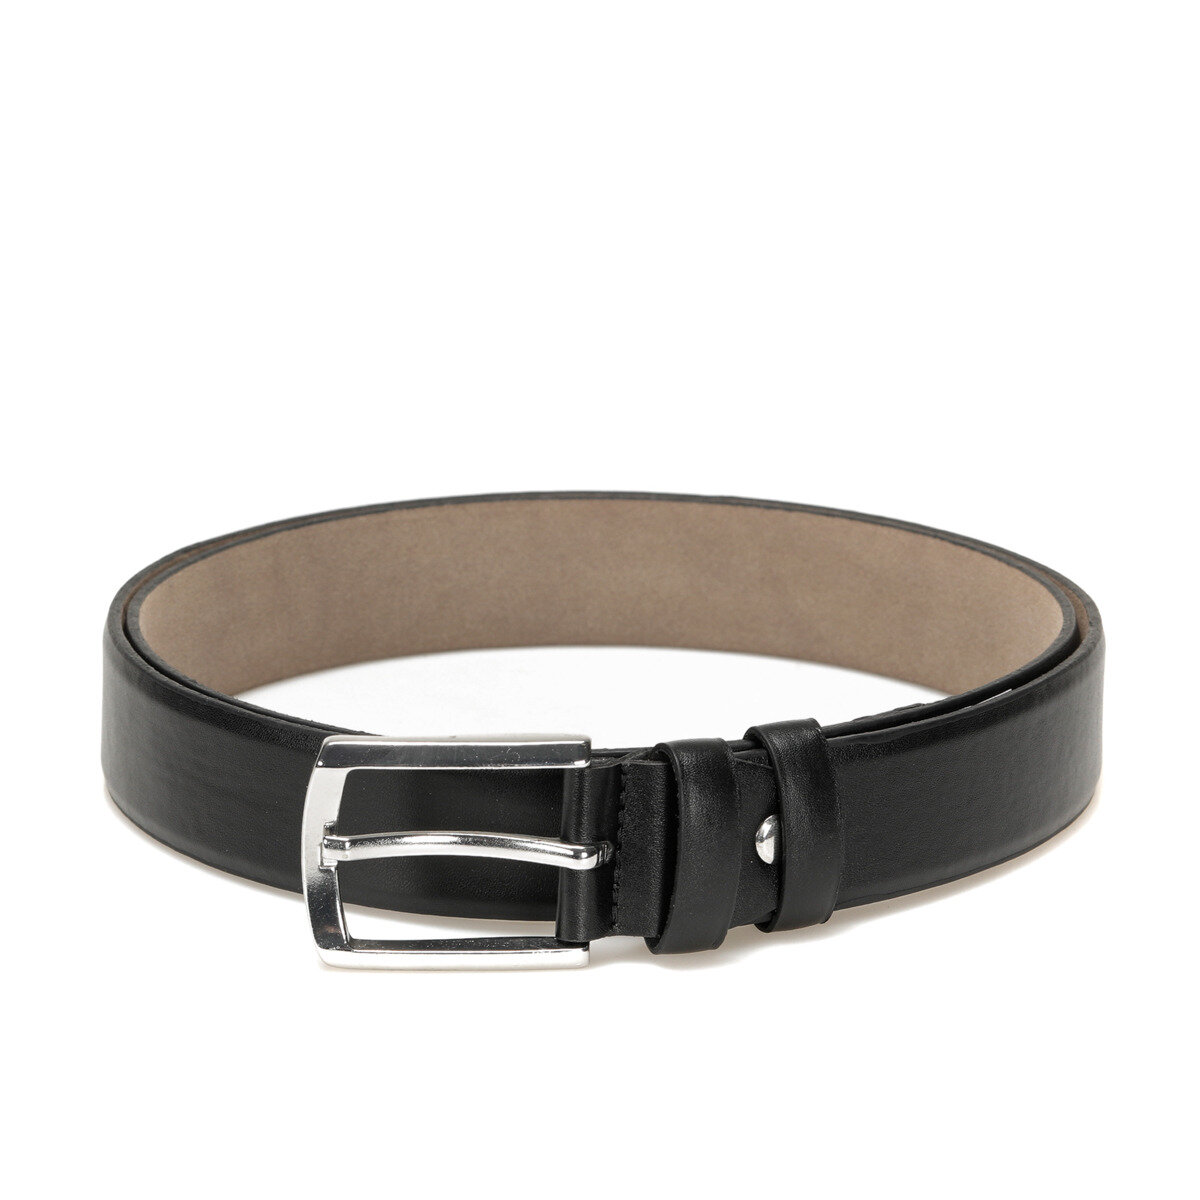 FLO MGVN3401 Black Male Belt Garamond